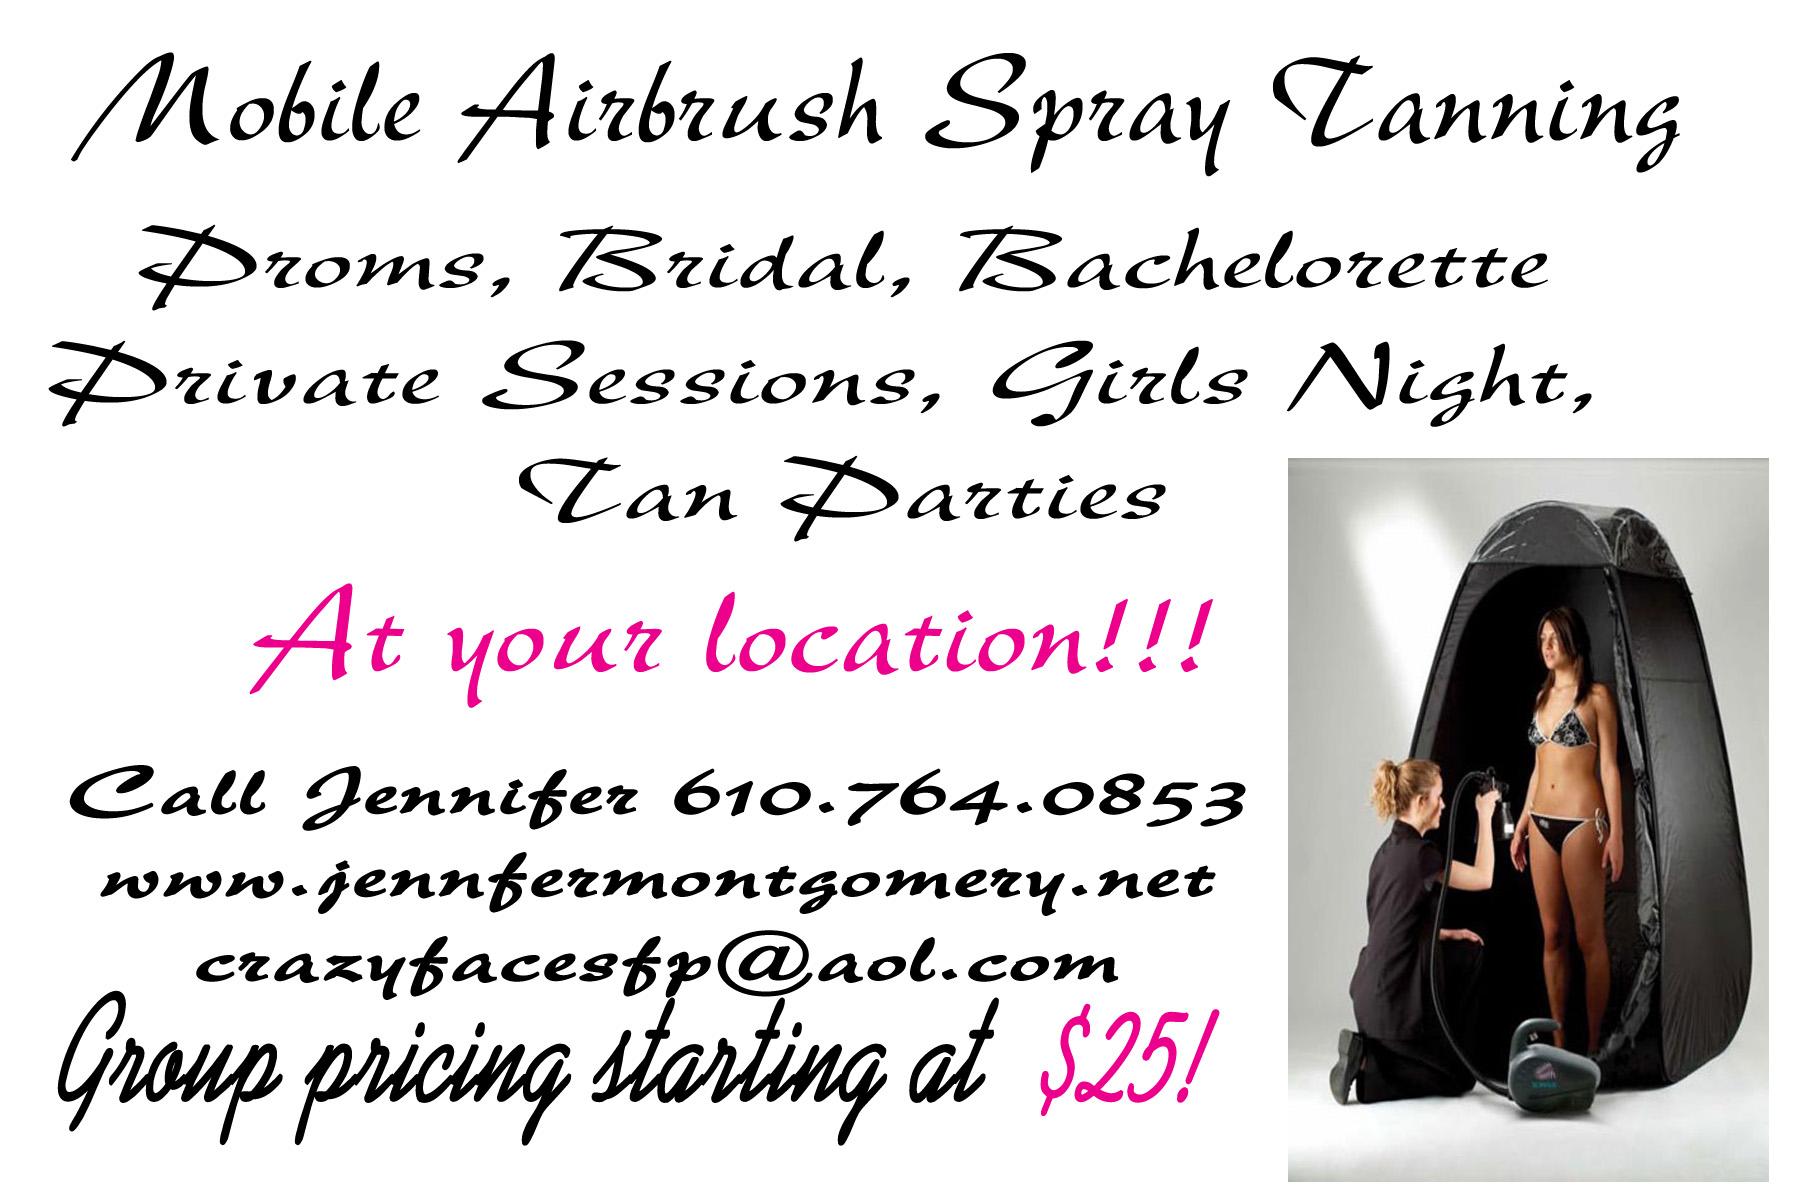 Airbrush Spray Tans Philadelphia PA Proms, Bridal, Tan Parties